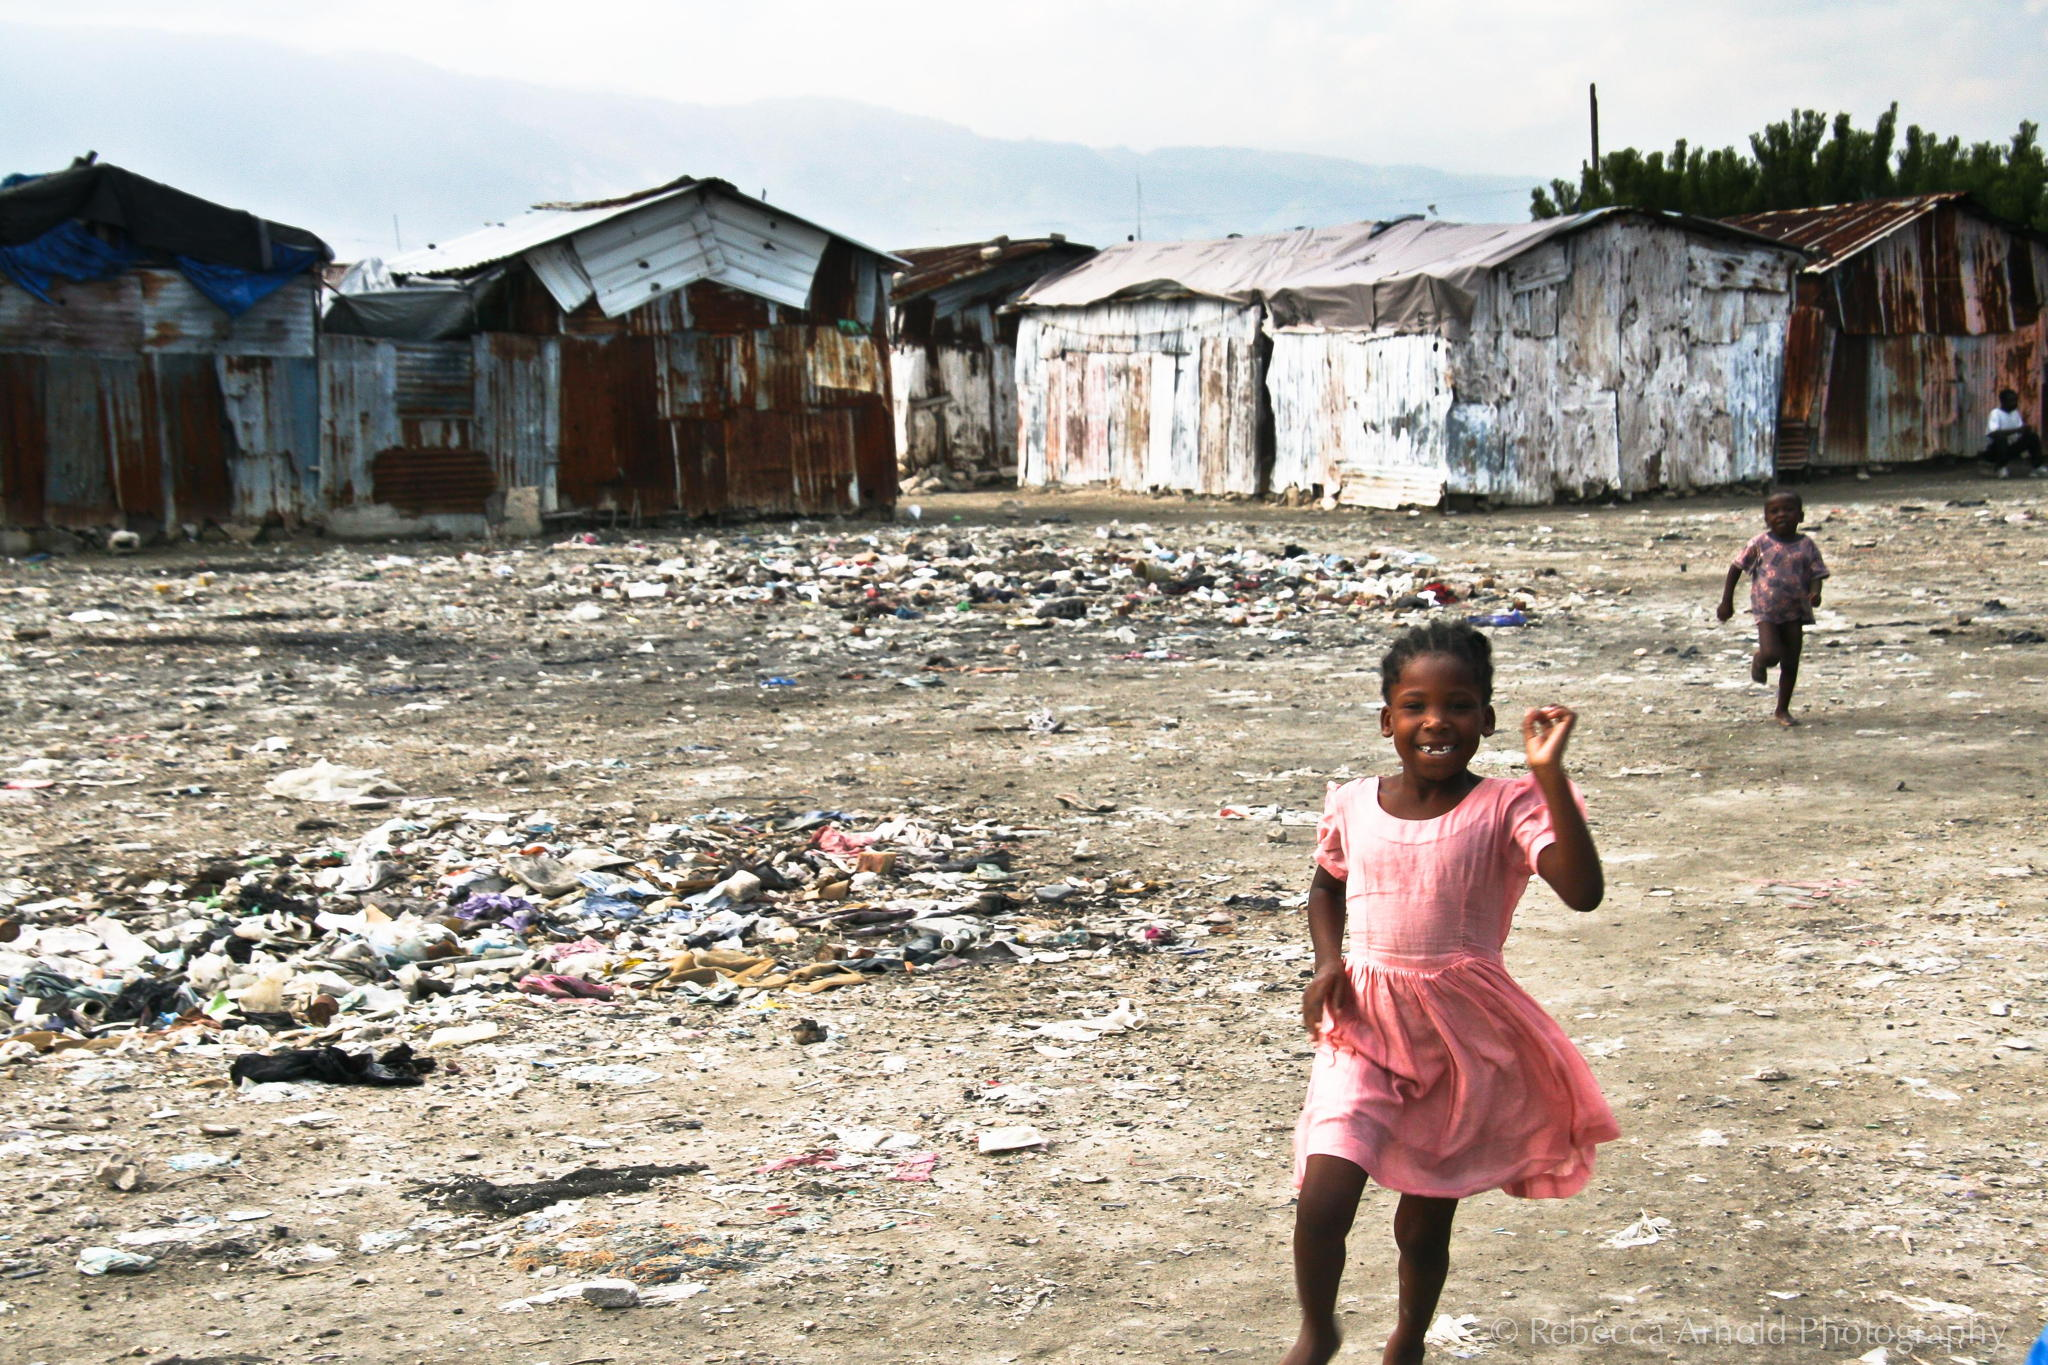 RArnold_Haiti personal_2012_UNalbum1541.jpg